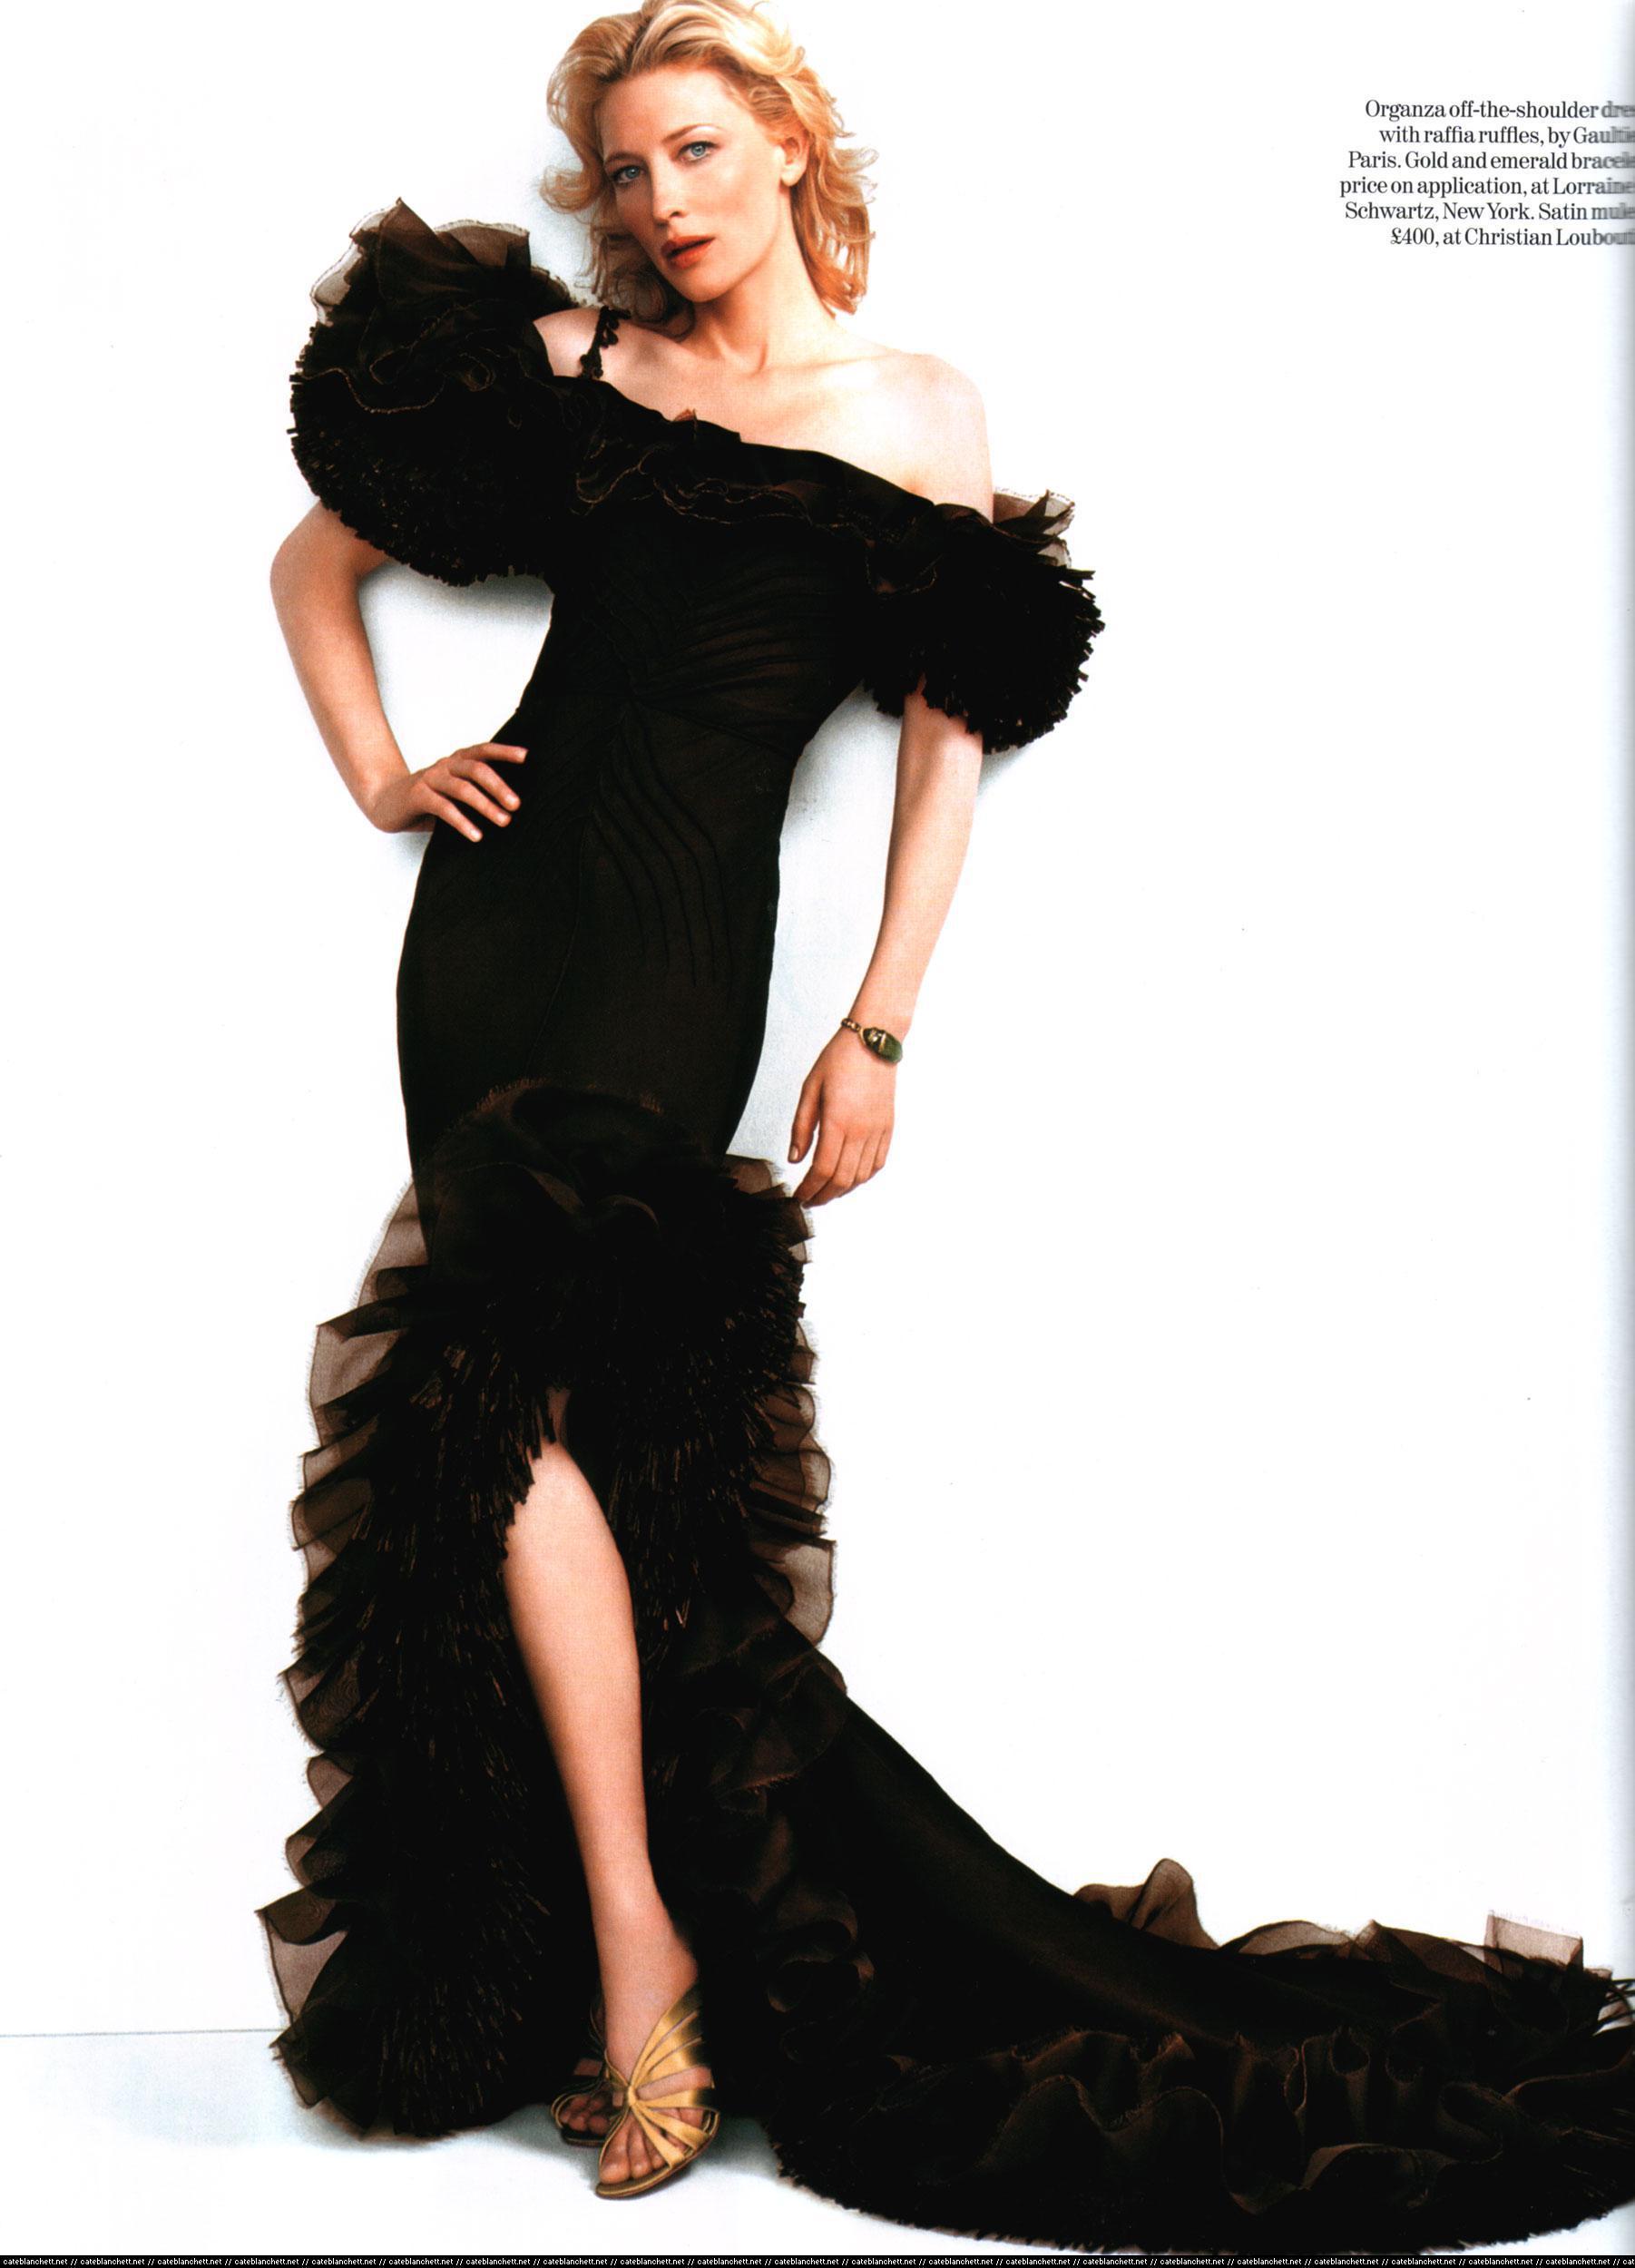 Cate Blanchett fotos filtradas de